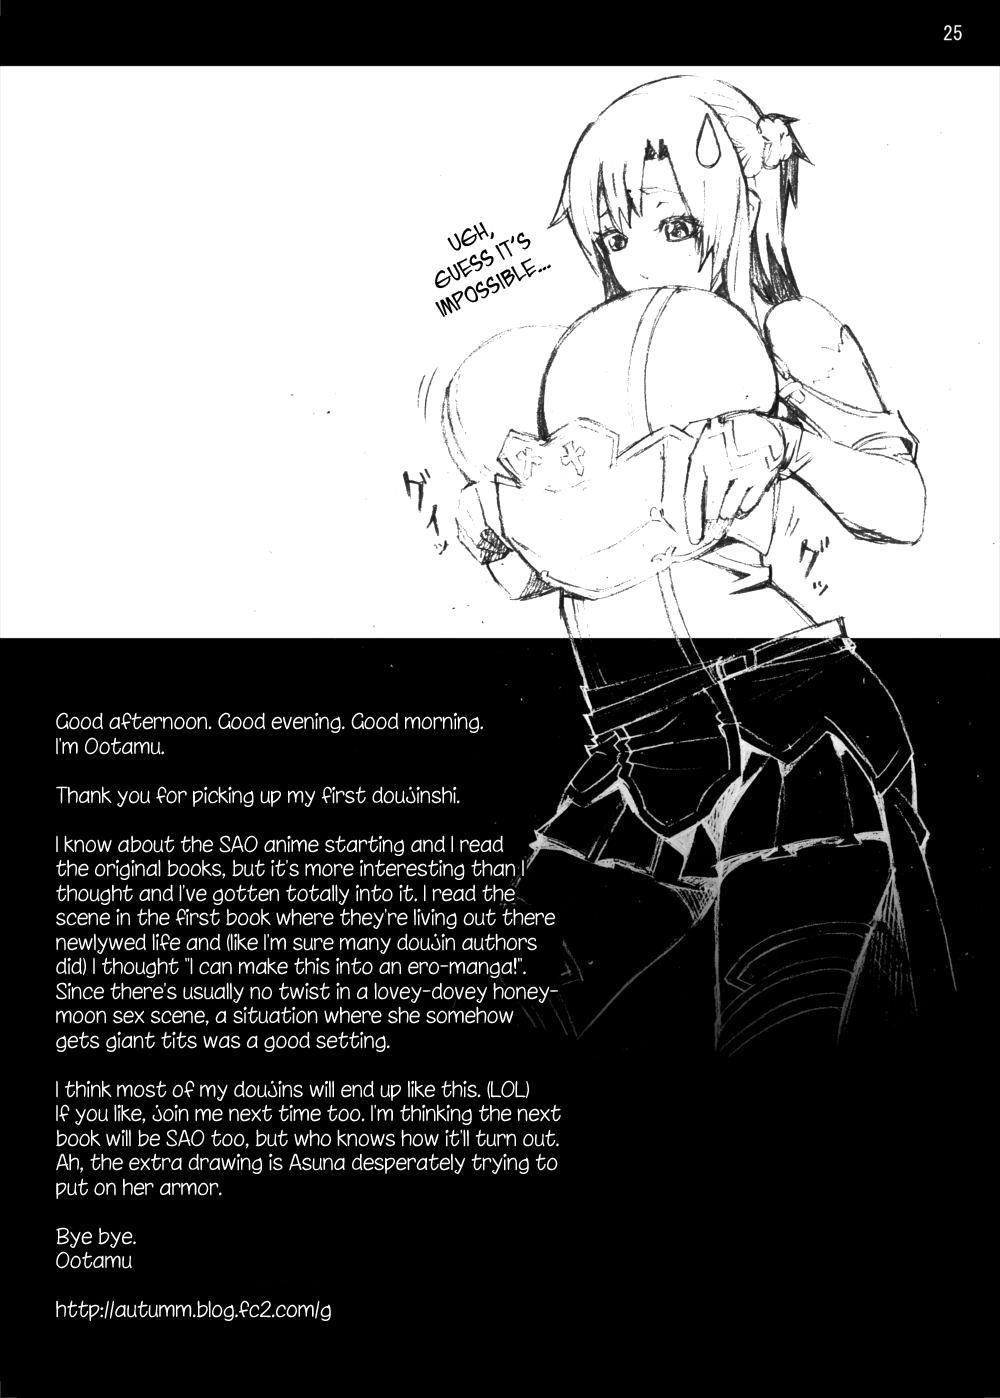 Asuna o Bakunyuu ni Shite Mita | I Gave Asuna Giant Tits 24